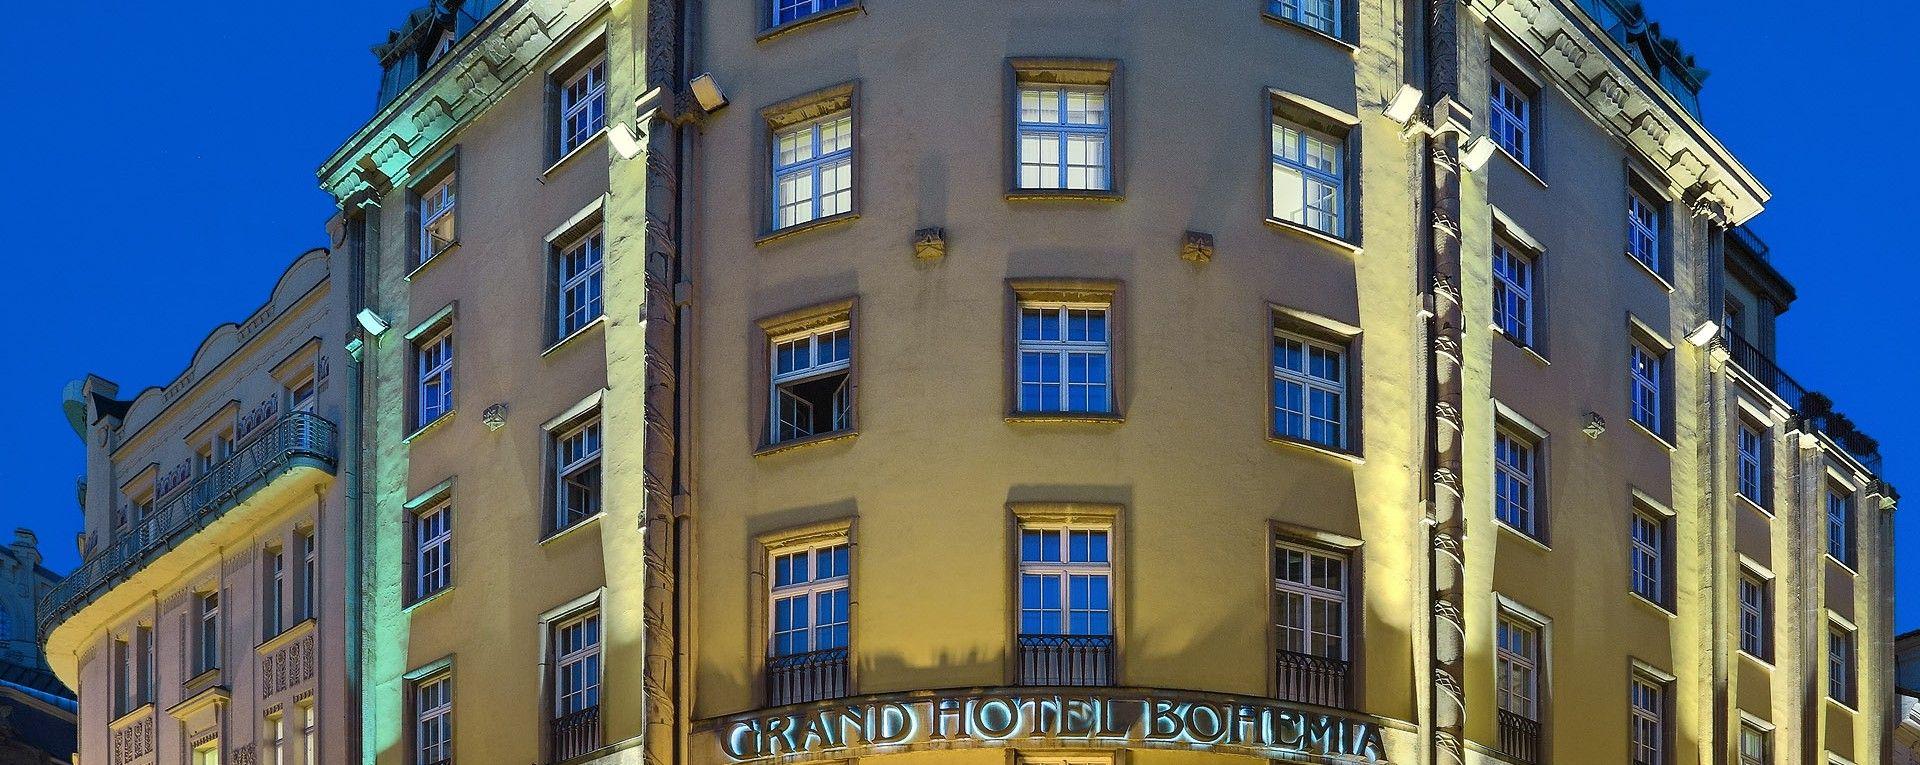 Grand hotel bohemia hotel prague czech republic europe for Grand hotel bohemia prague reviews